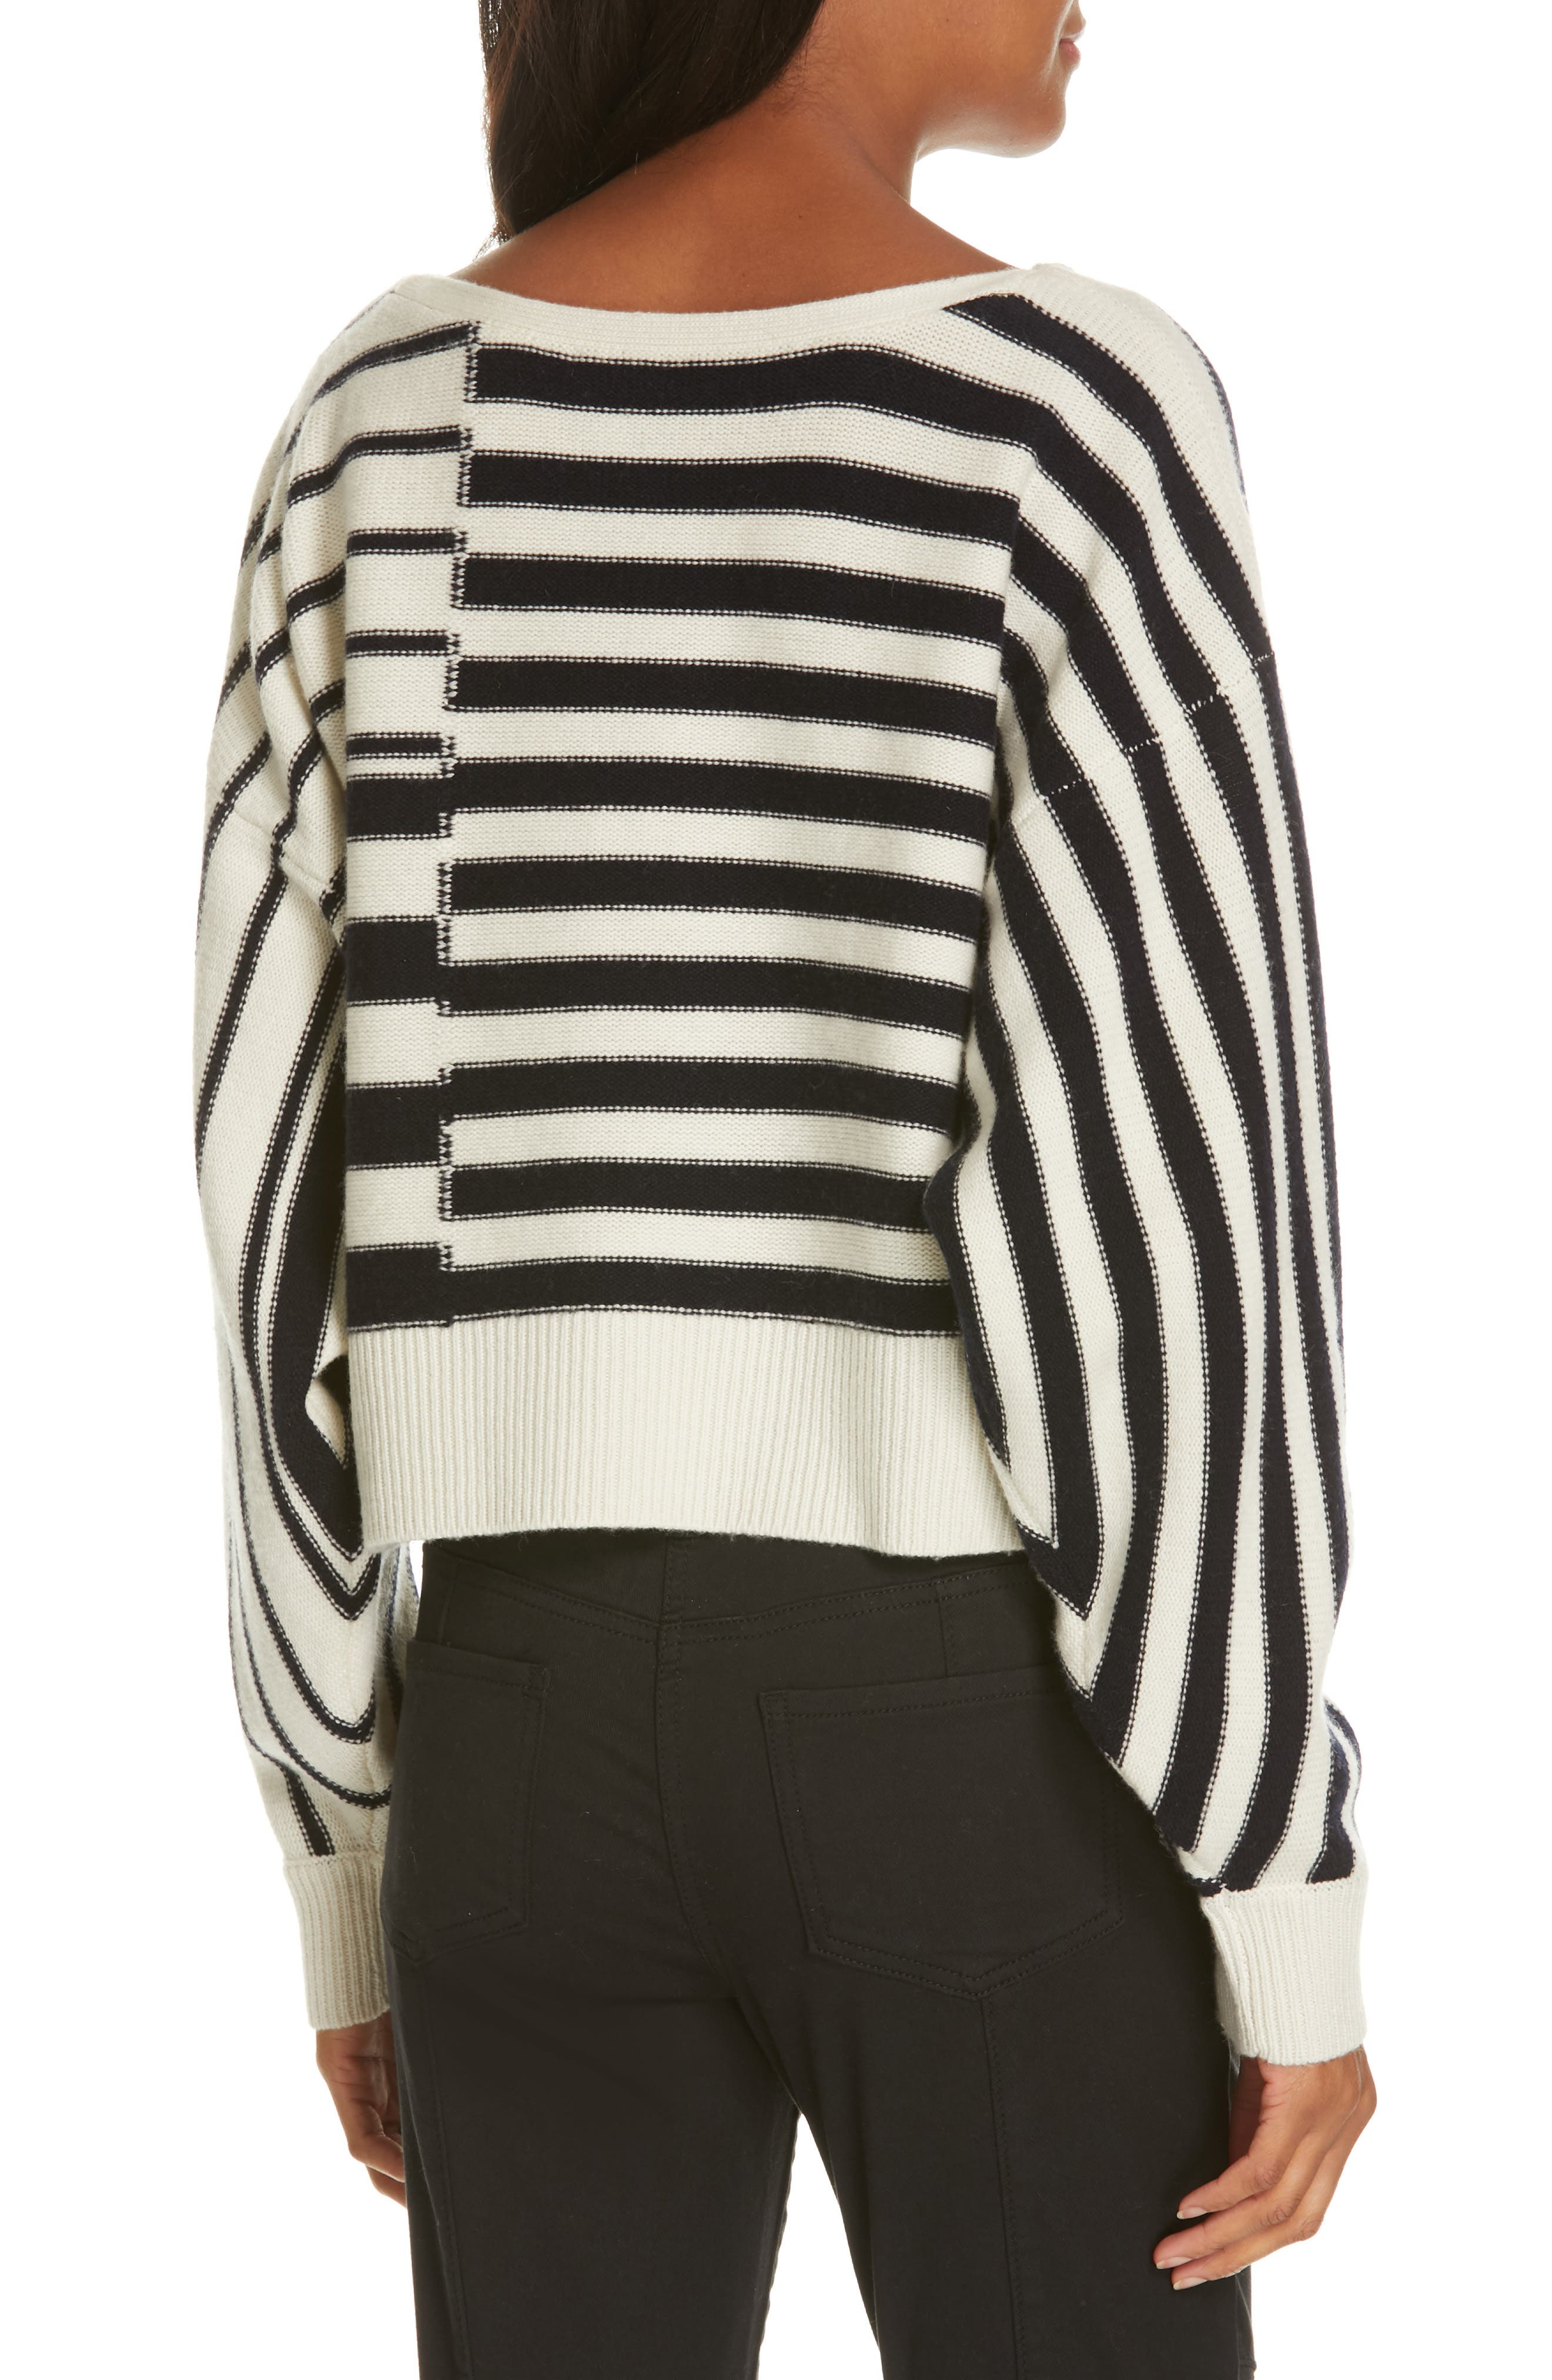 Maridel Sweater,                             Alternate thumbnail 2, color,                             PORCELAIN MIDNIGHT